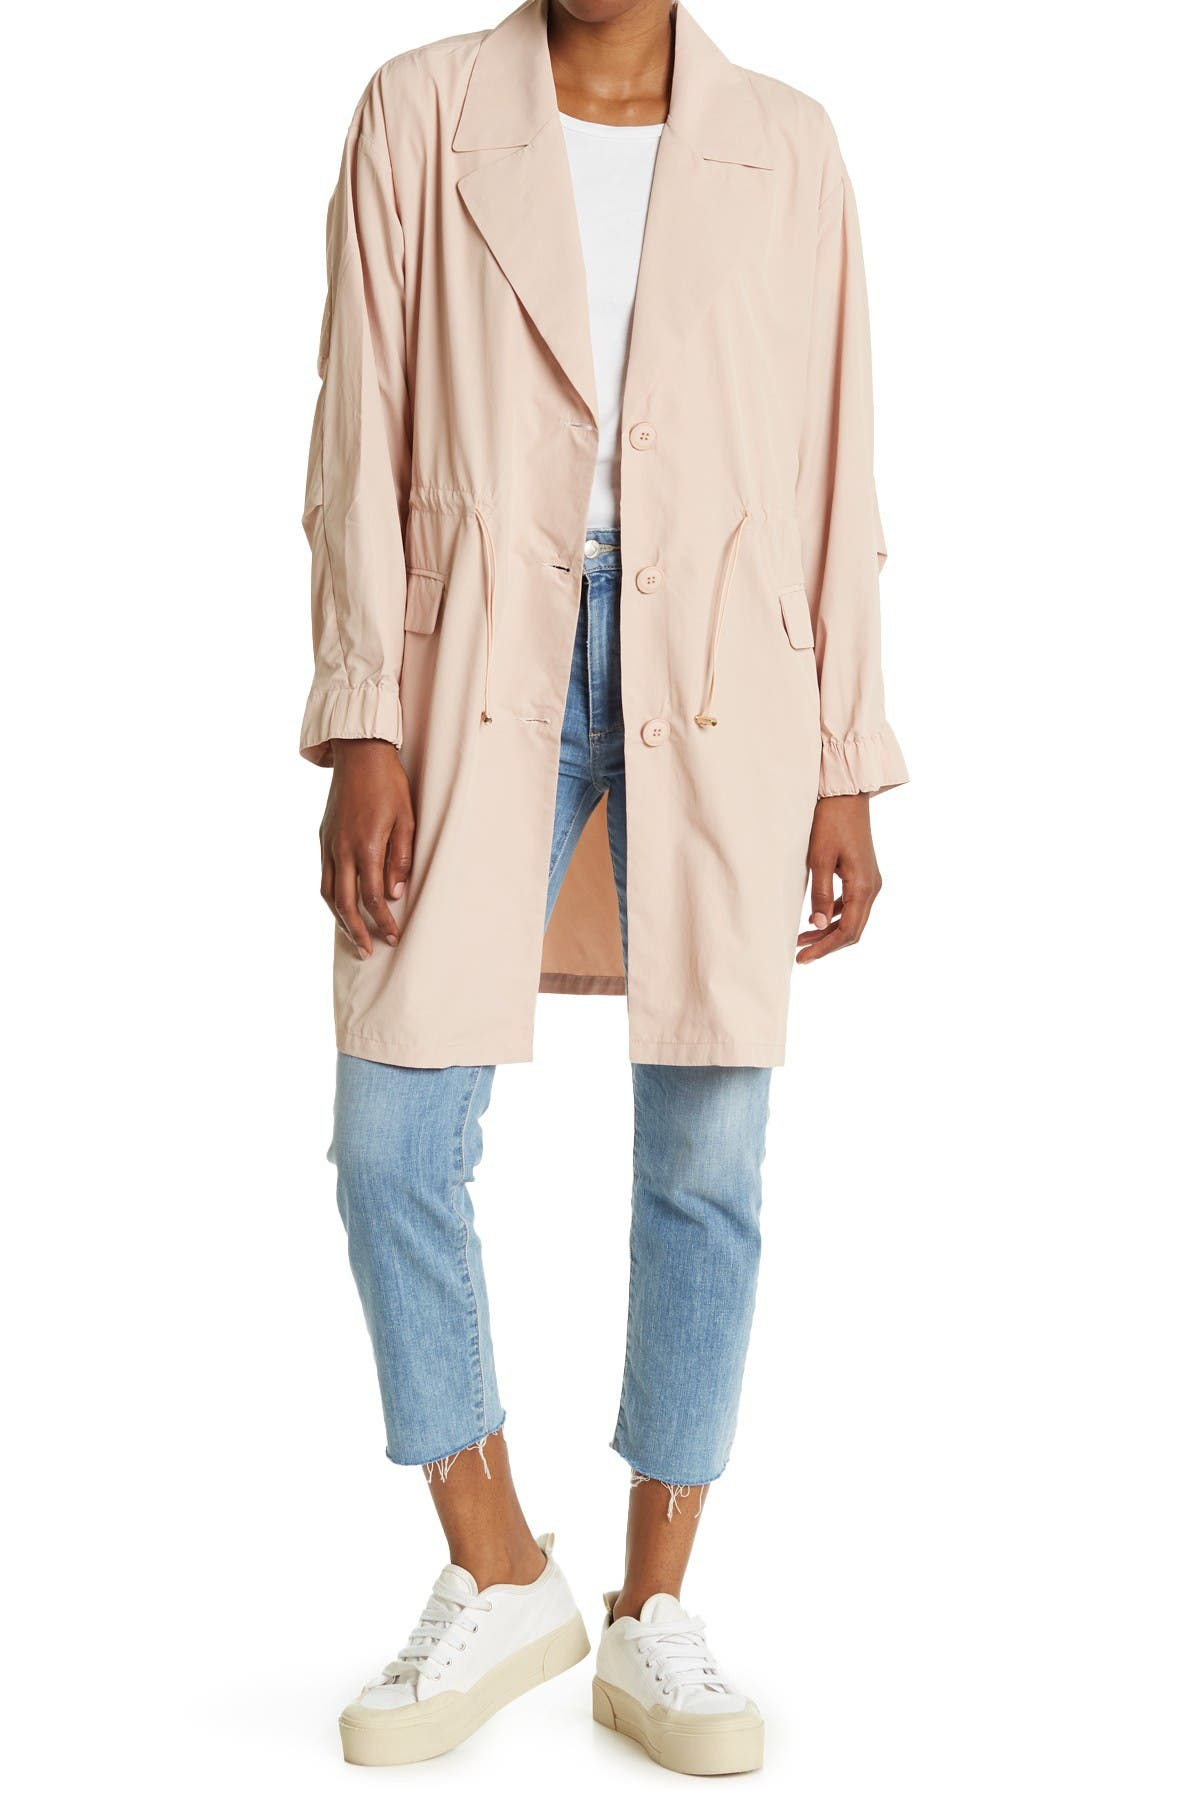 Image of SEE U SOON Drawstring Waist Trench Jacket